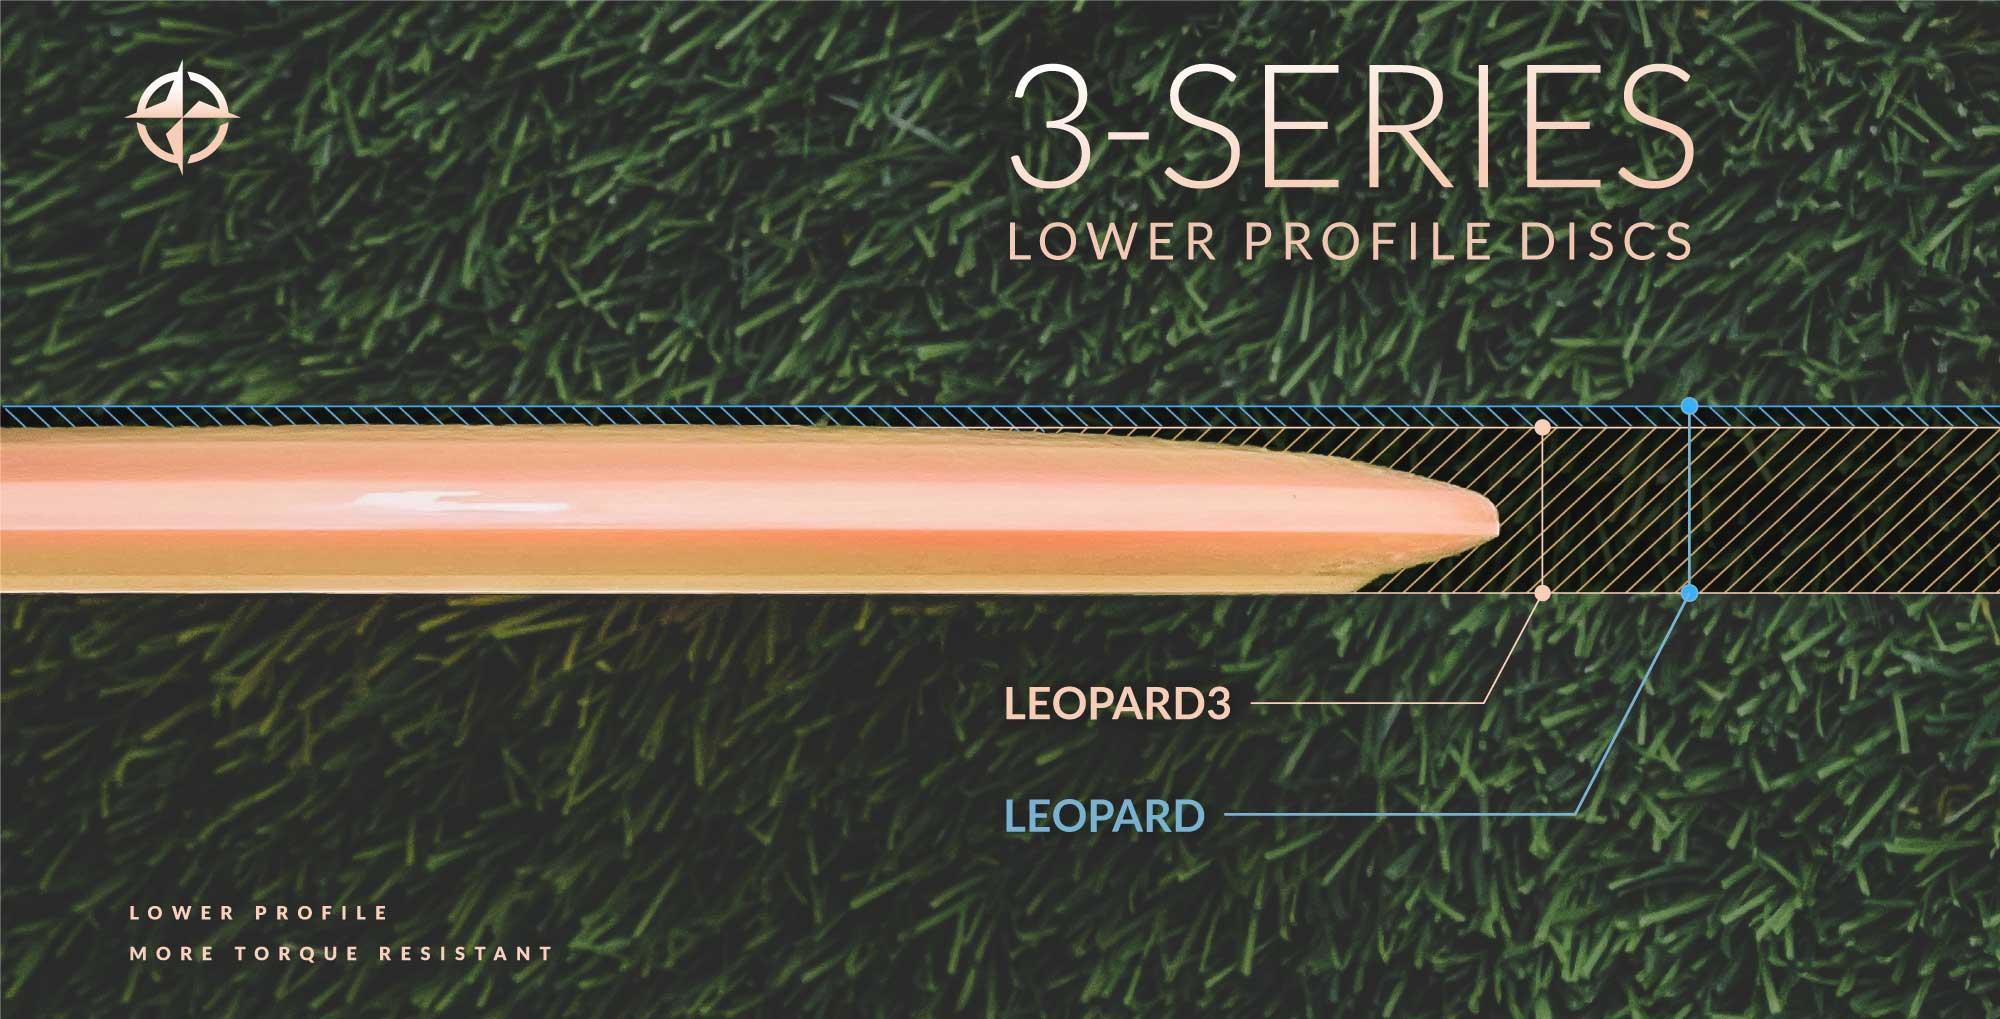 Innova Leopard3 3-Series Profile